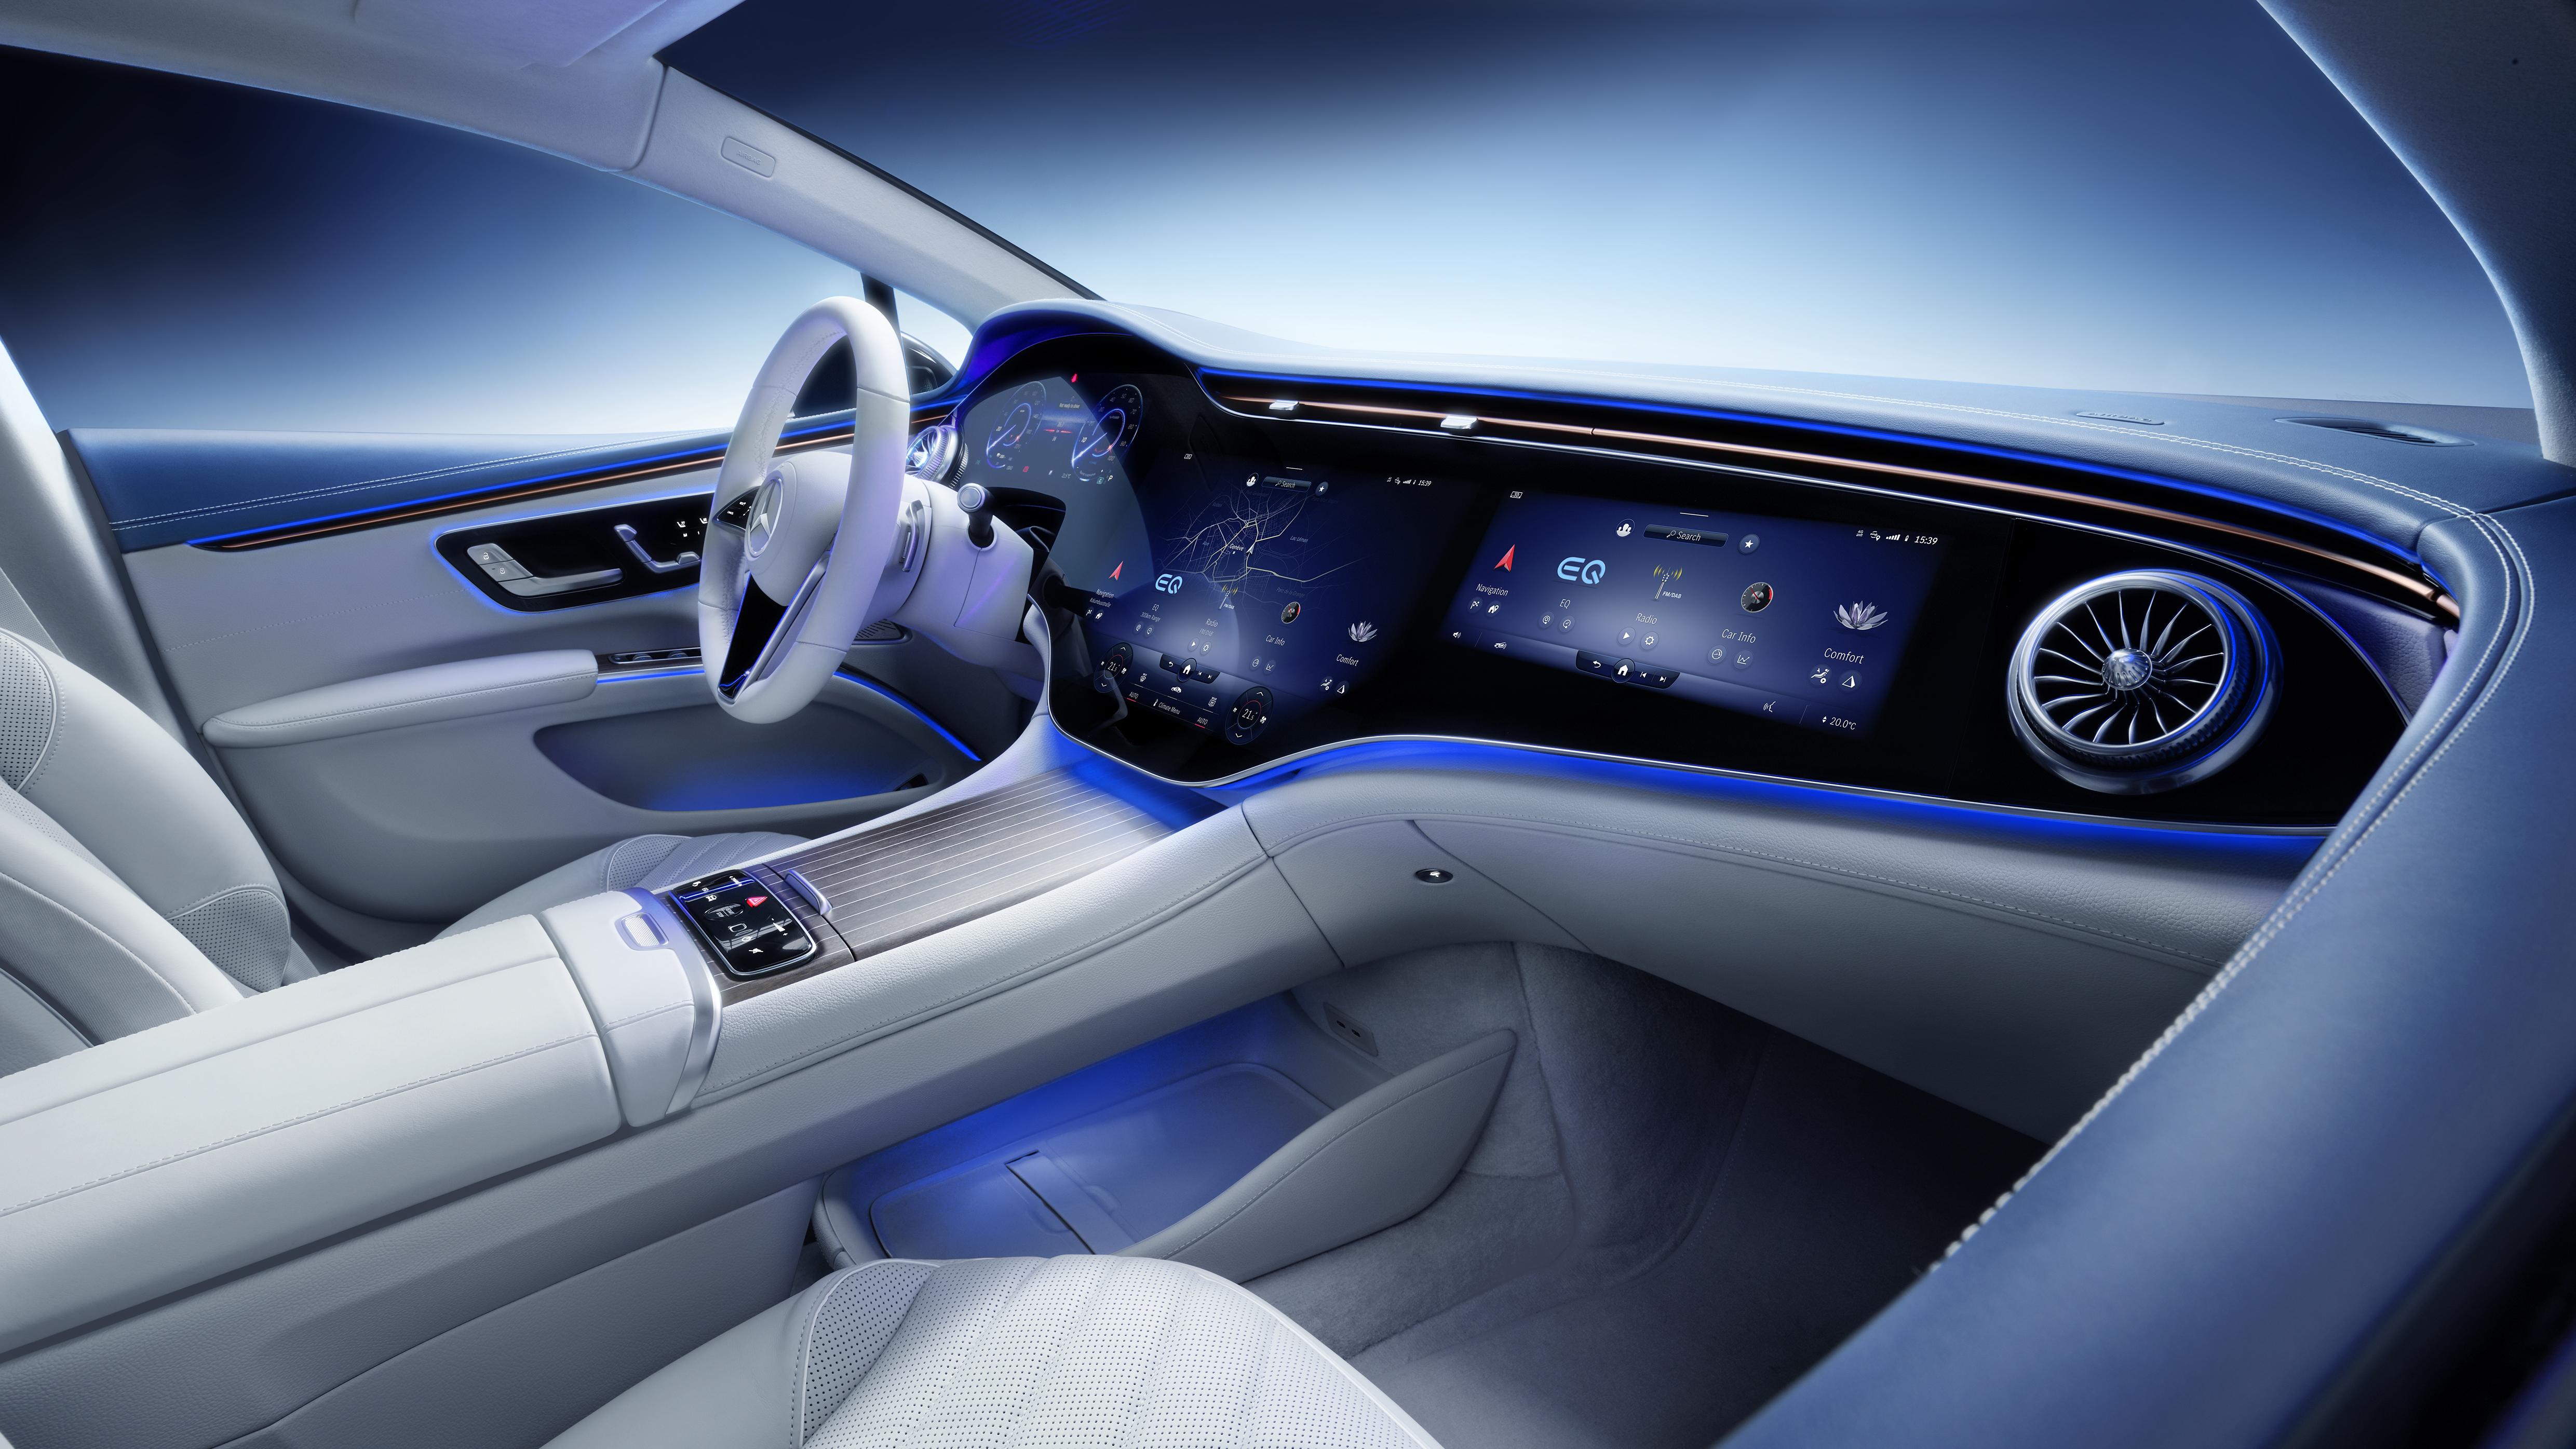 Mercedes-EQ, EQS, Interieur, MBUX Hyperscreen Mercedes-EQ, EQS, Interior, MBUX Hyperscreen